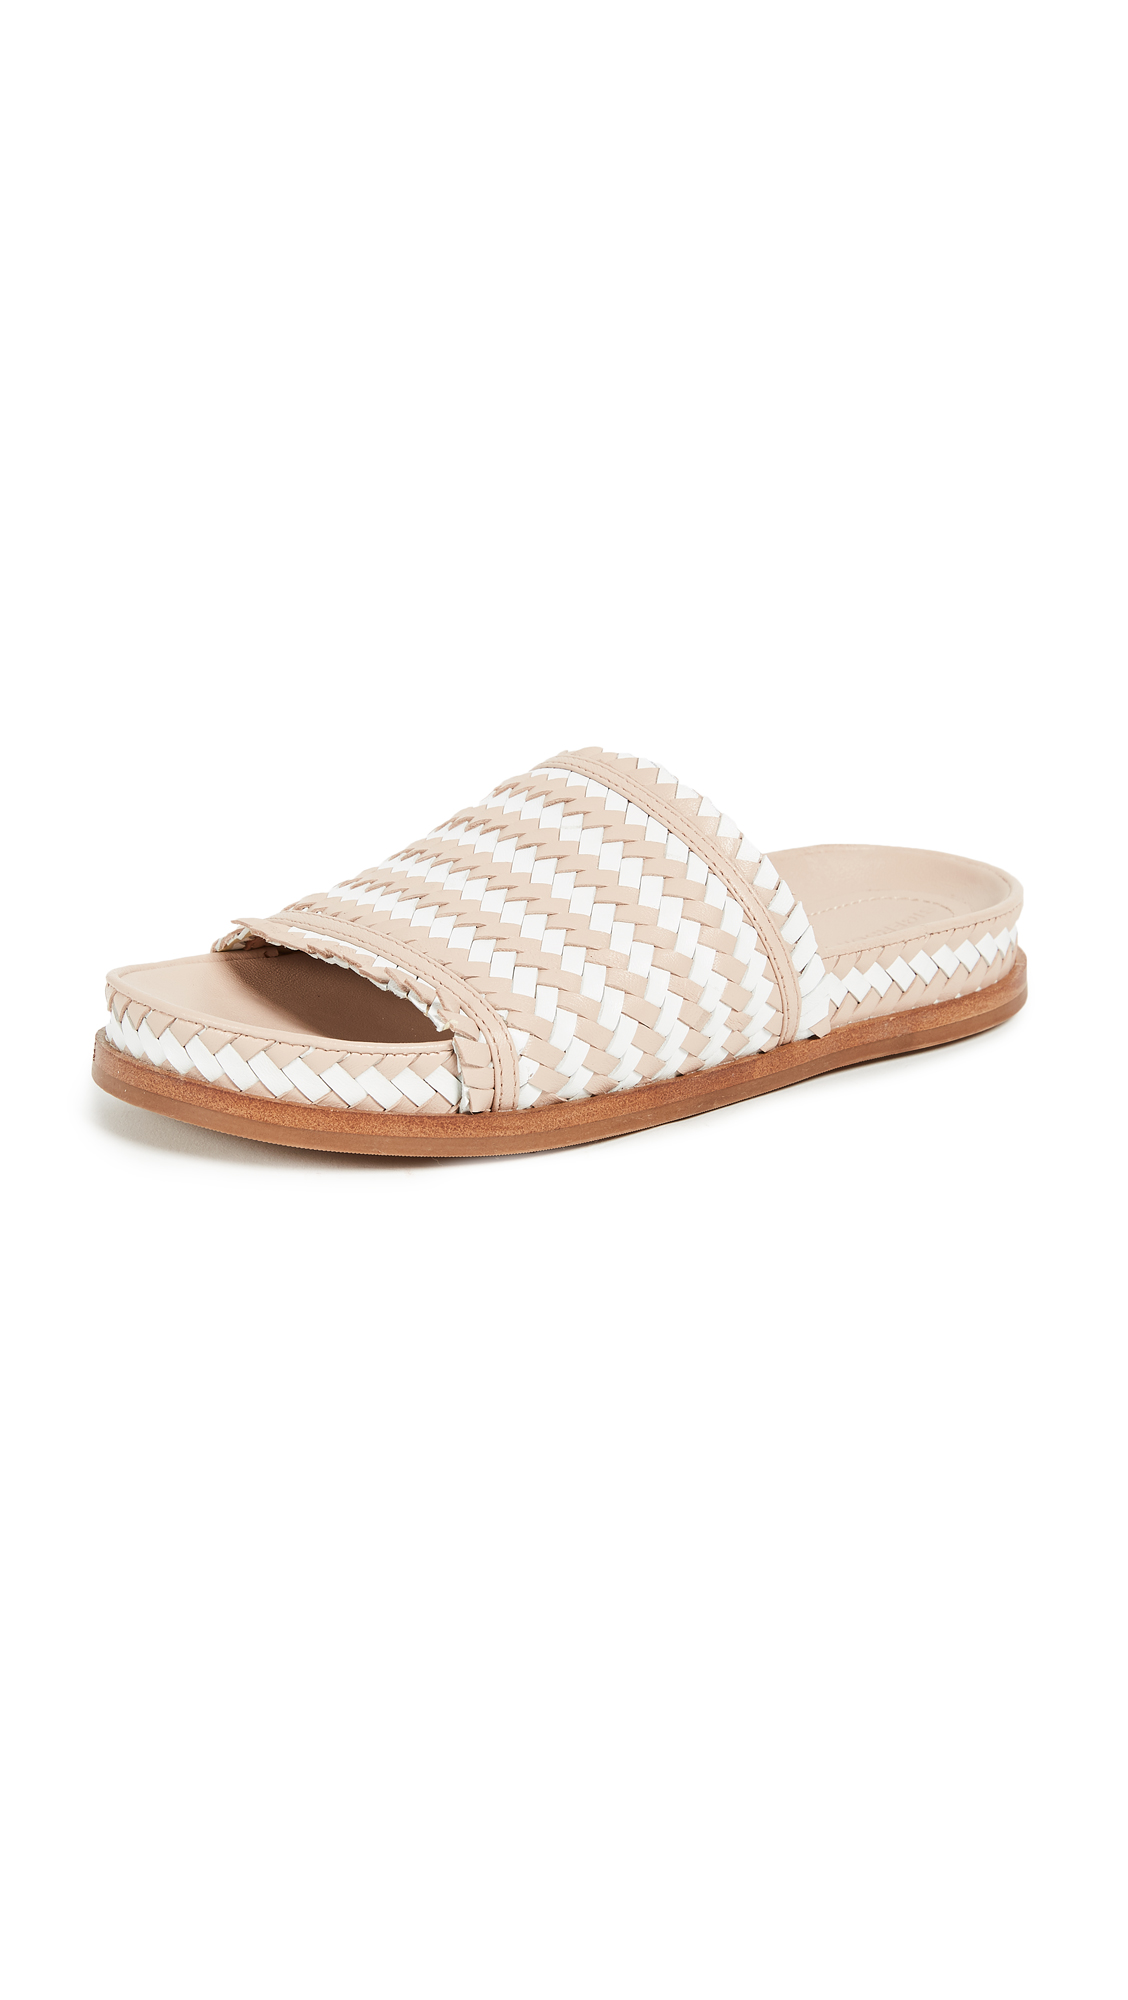 Sigerson Morrison Aoven Woven Sandals - Blush/White